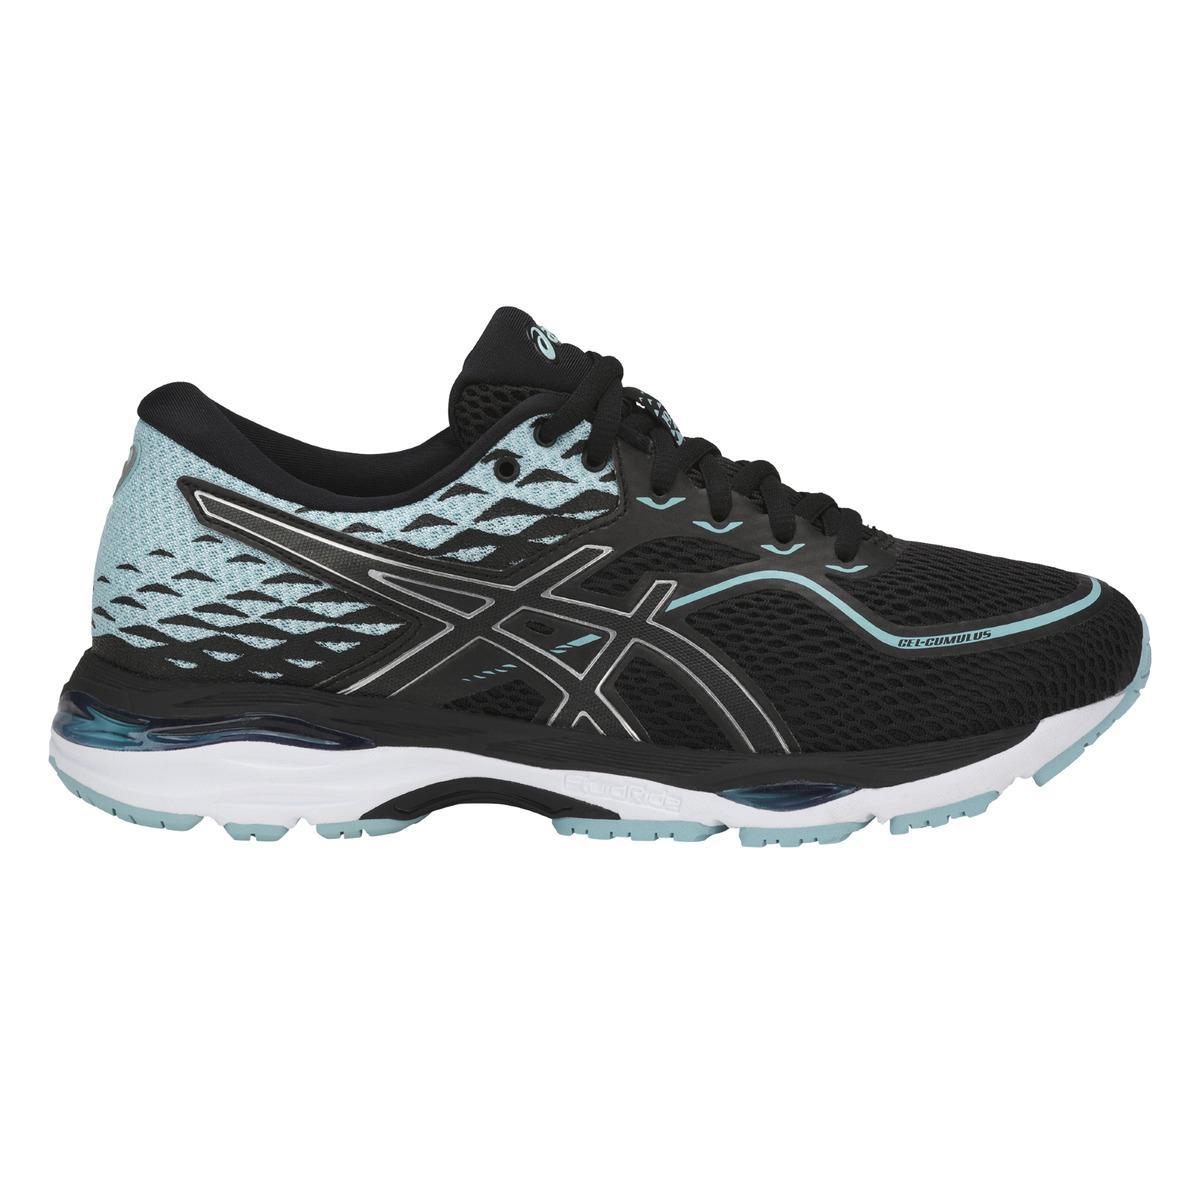 Lyst - Asics Gel-cumulus 19 Running Shoes in Black - Save 12% a3b480177